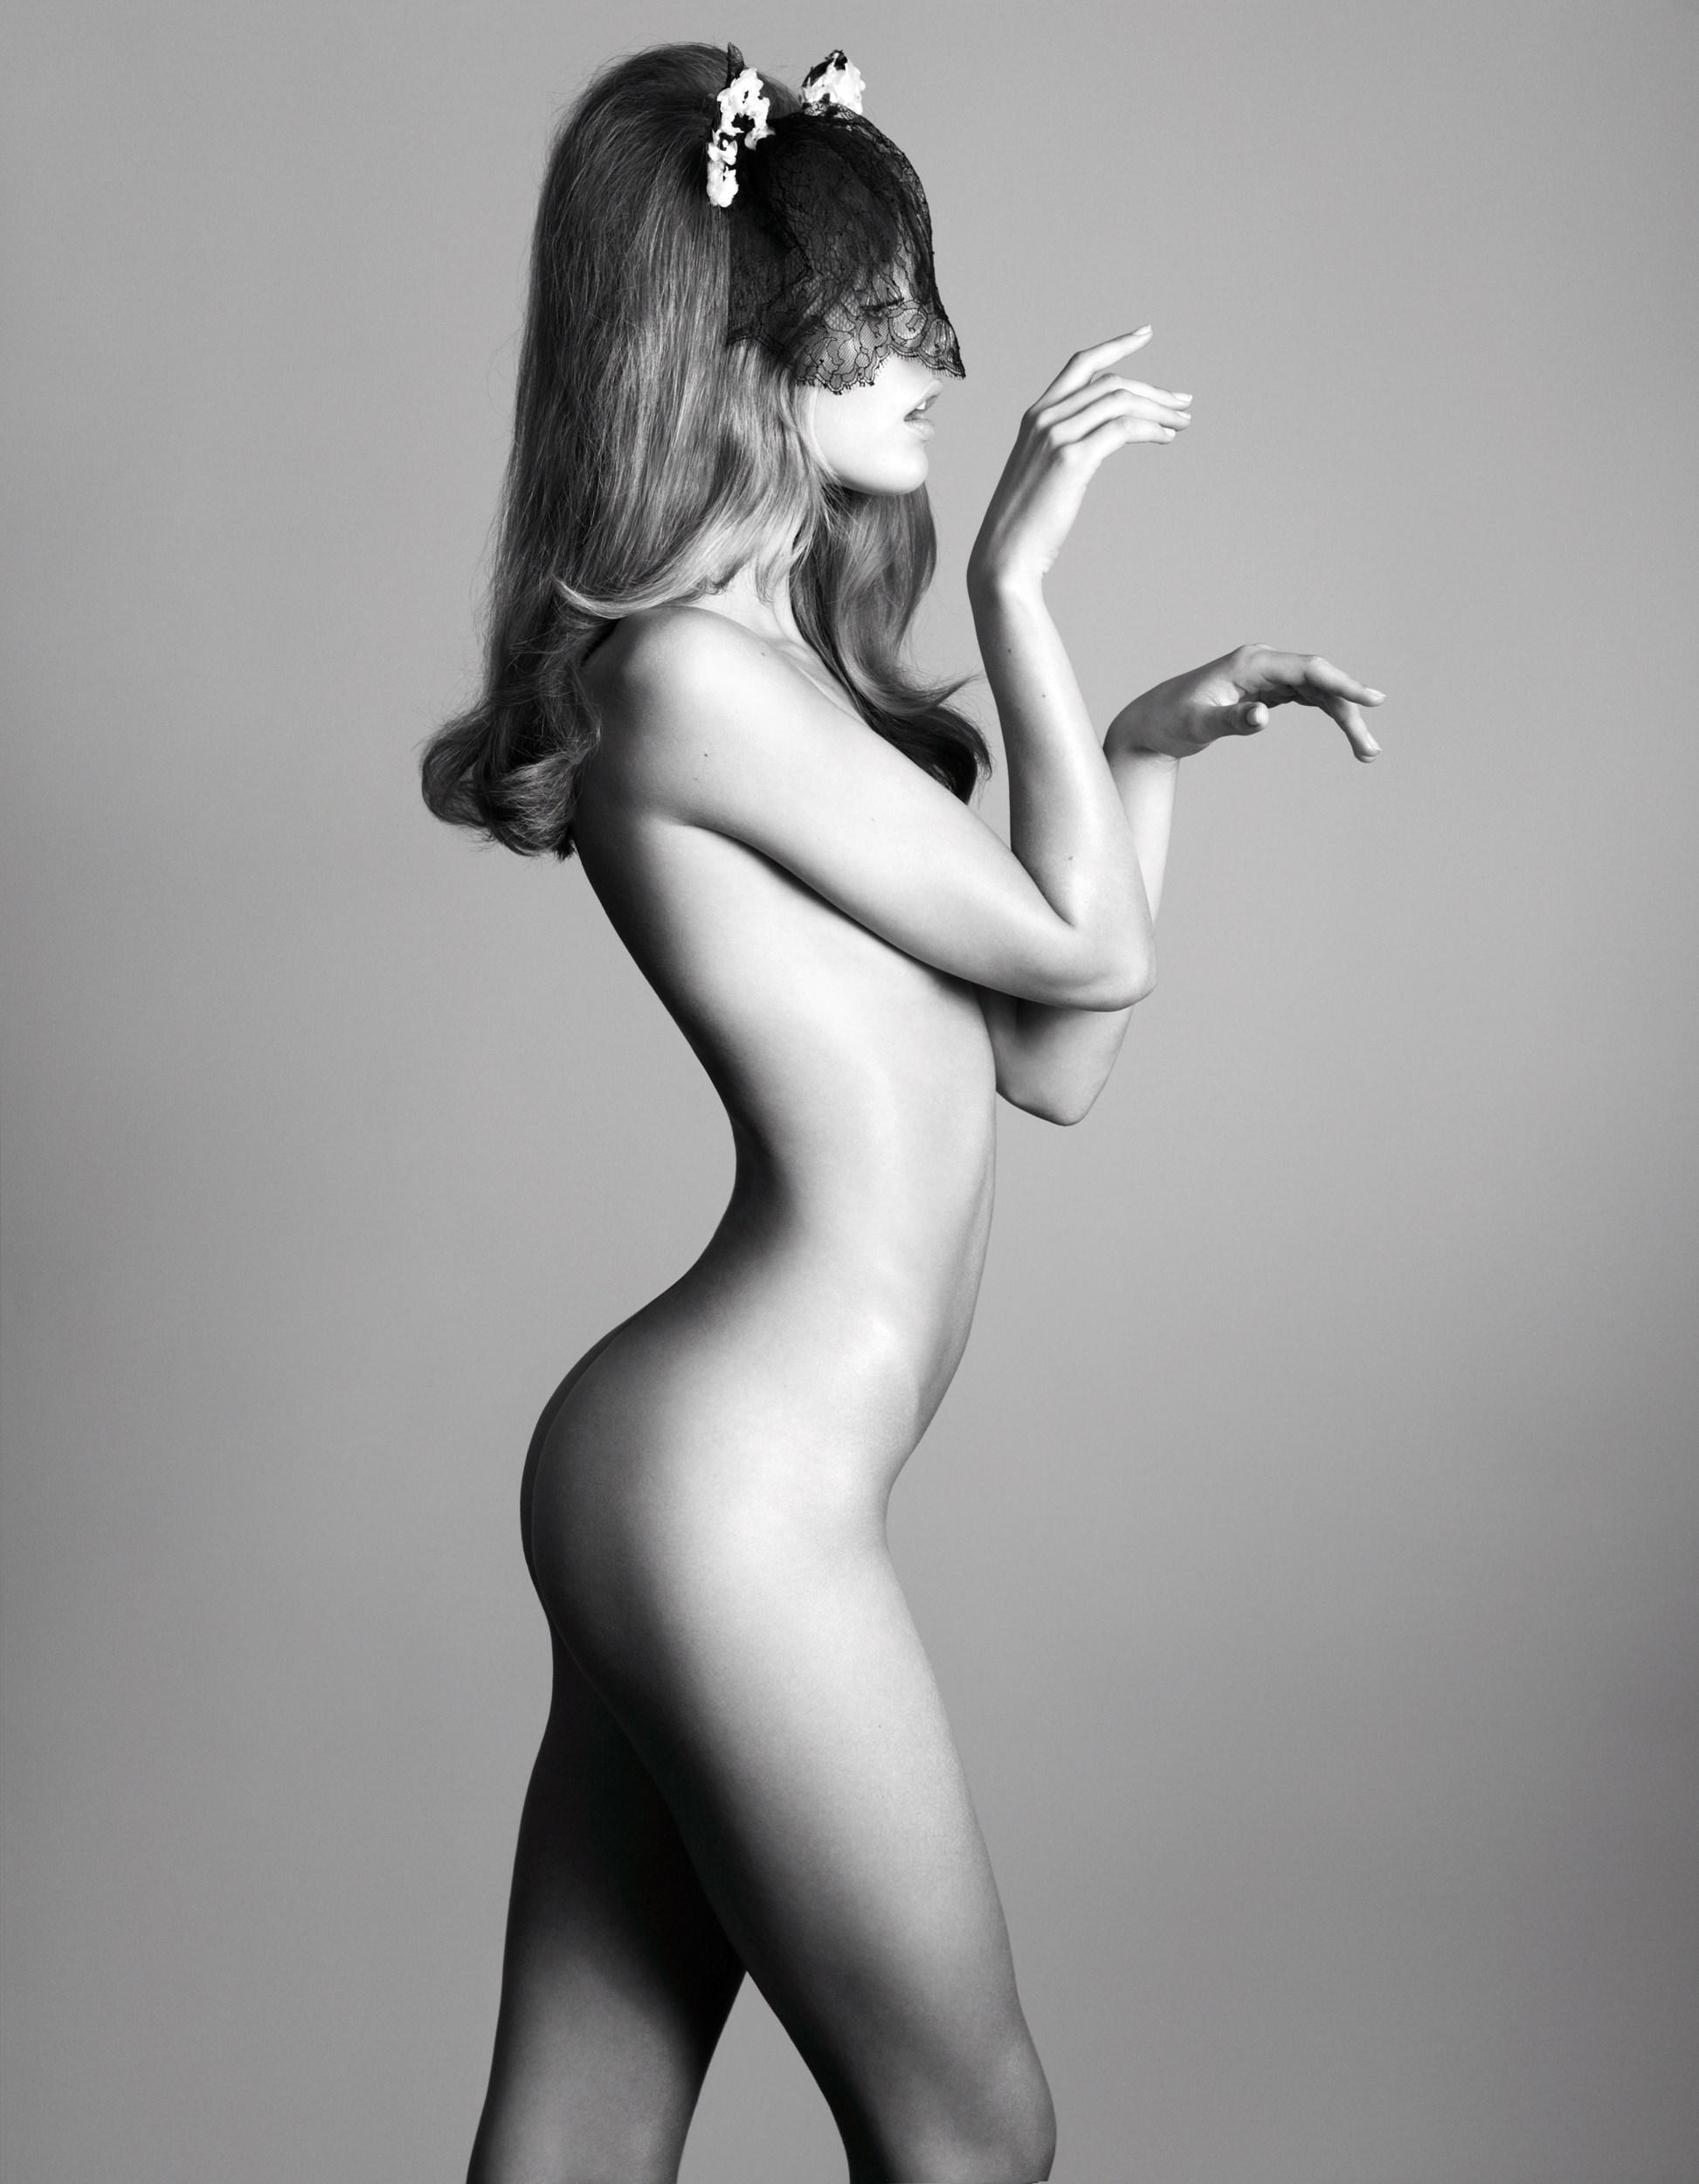 Porno Frida Gustavsson naked (79 photo), Sexy, Sideboobs, Feet, braless 2017